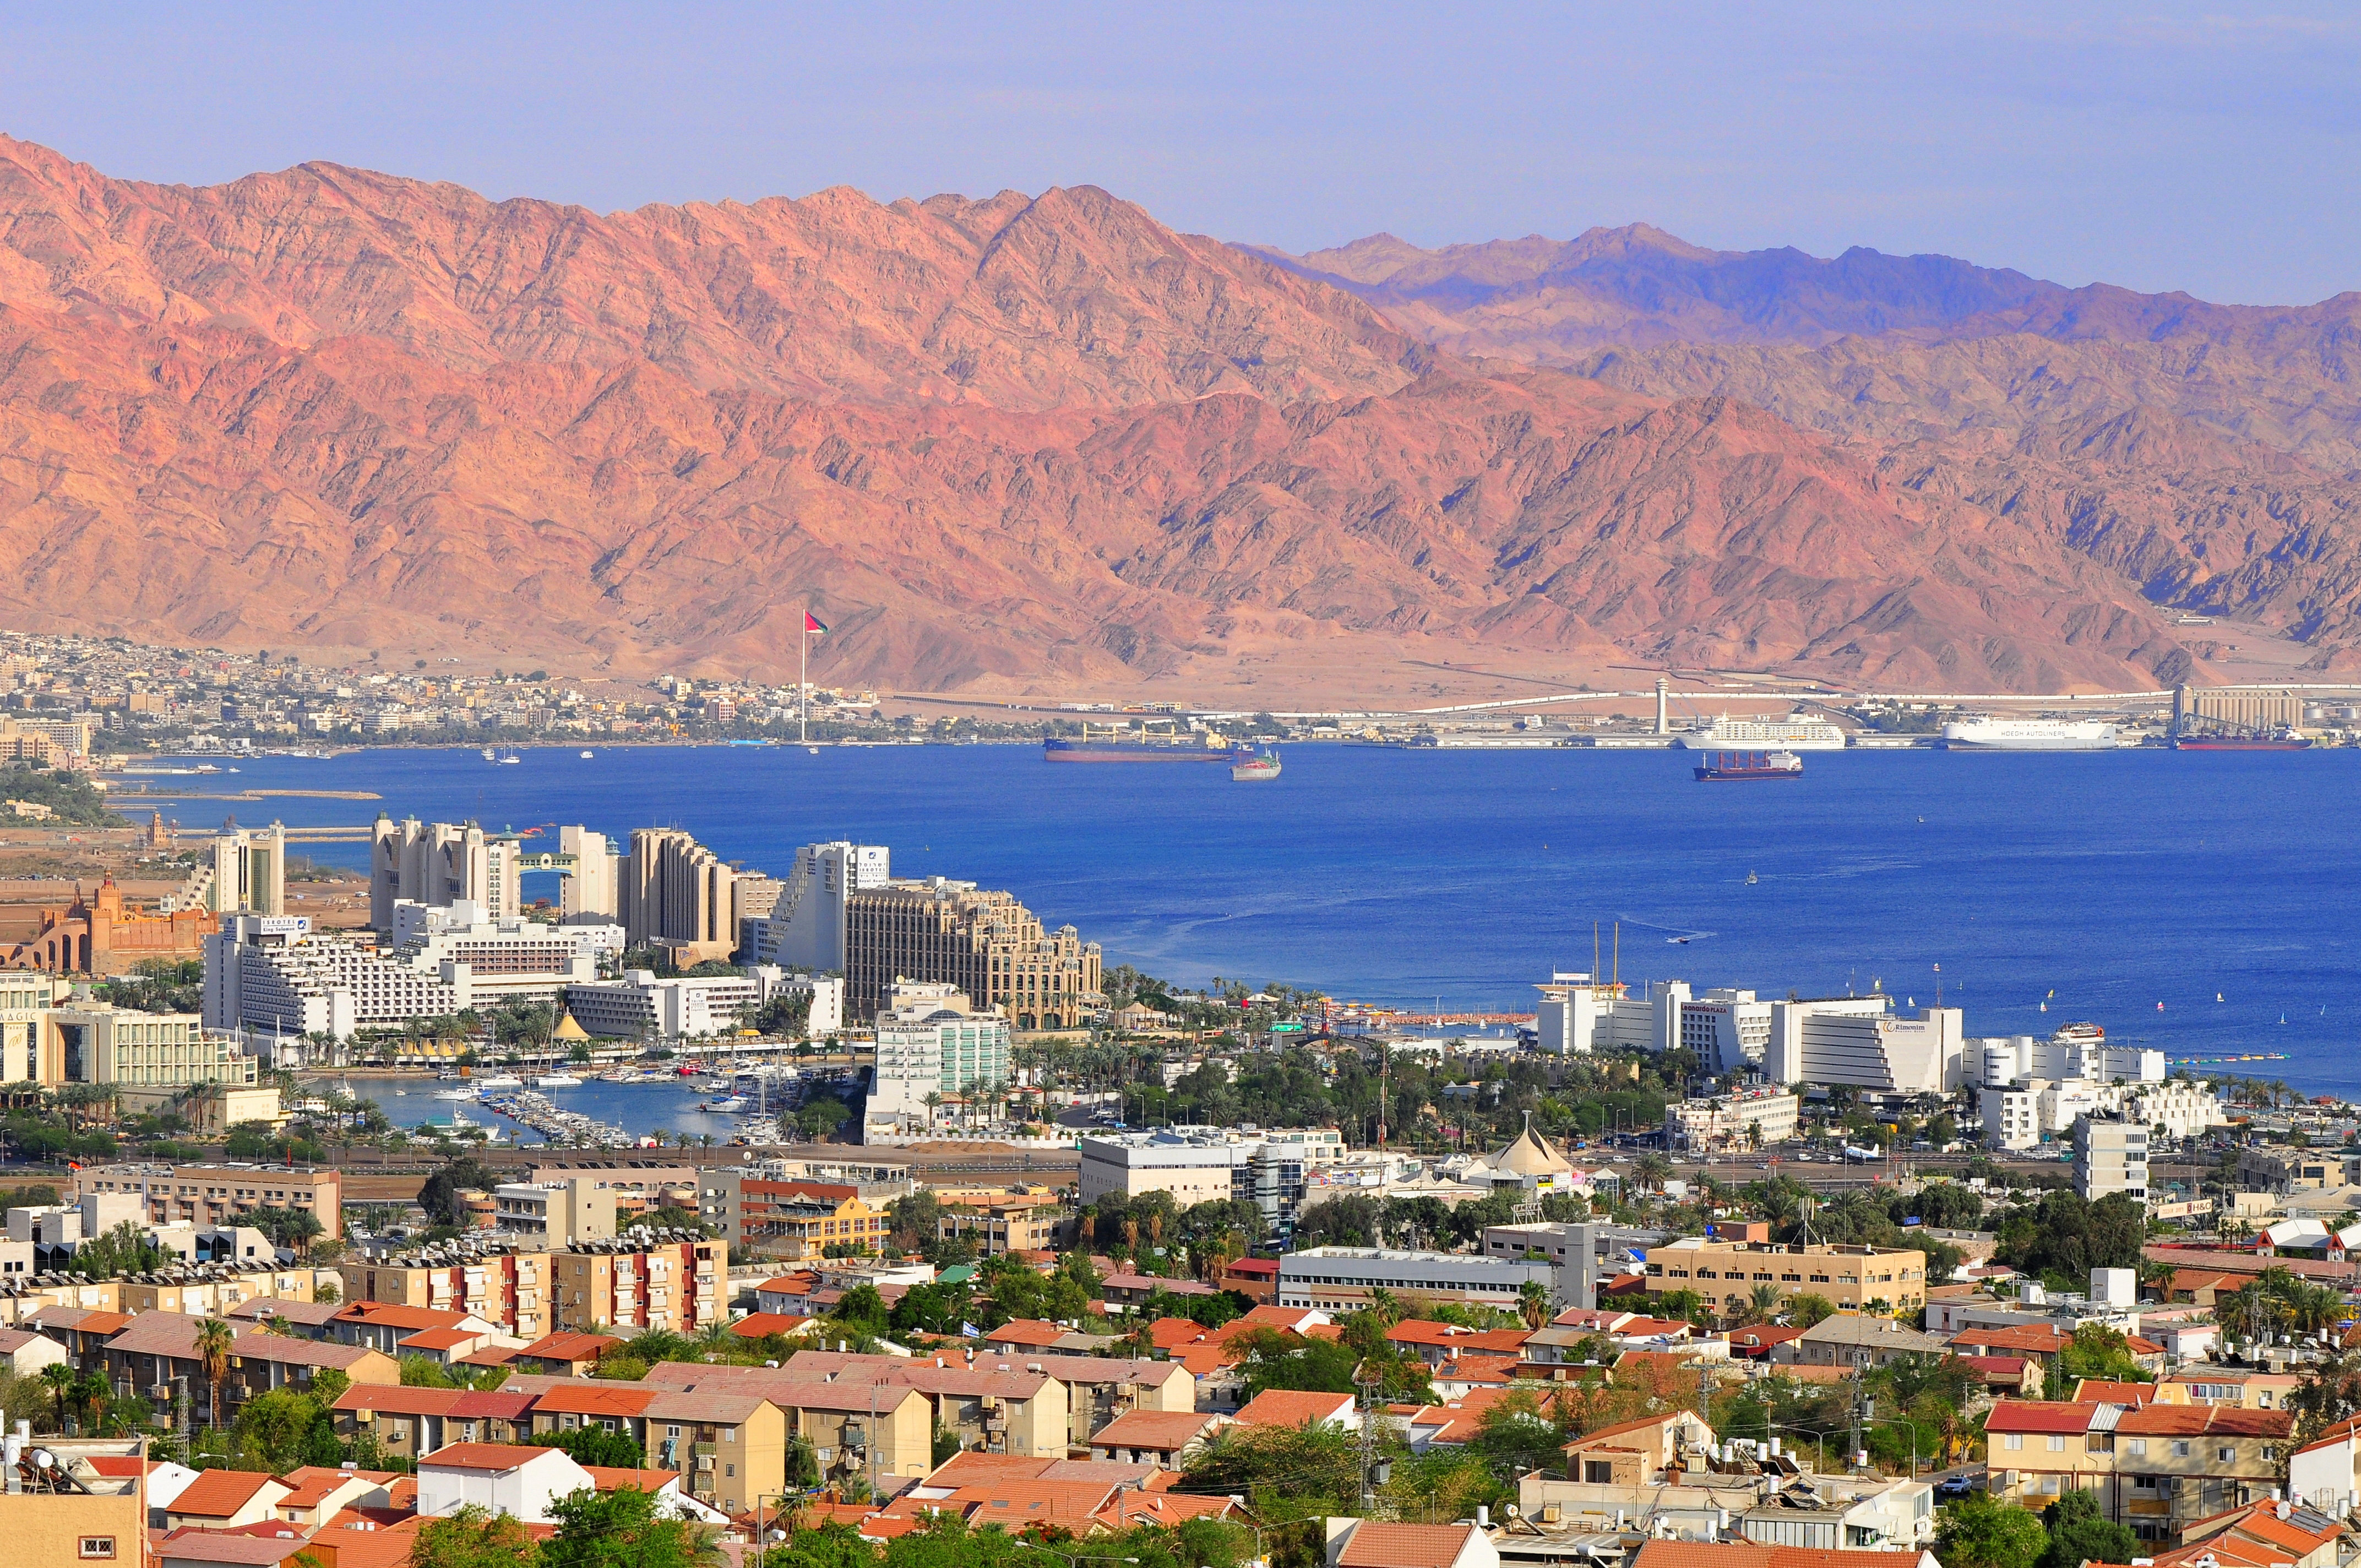 Eilat Bird's eye view (Photo: Shutterstock)